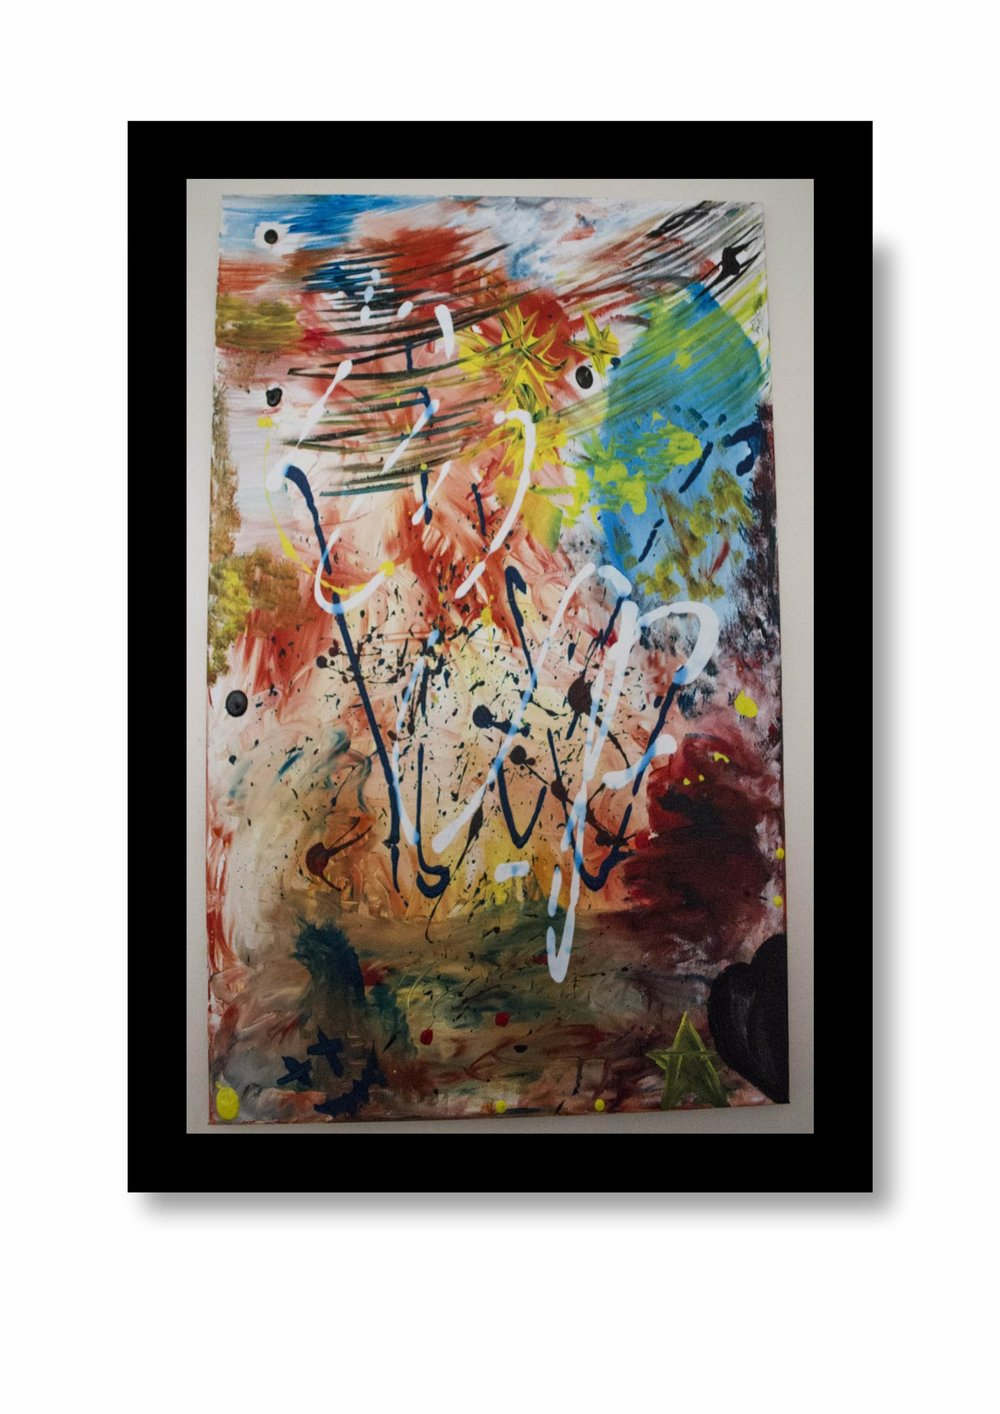 art-portfolio-aglae-corrected-6-min.jpg